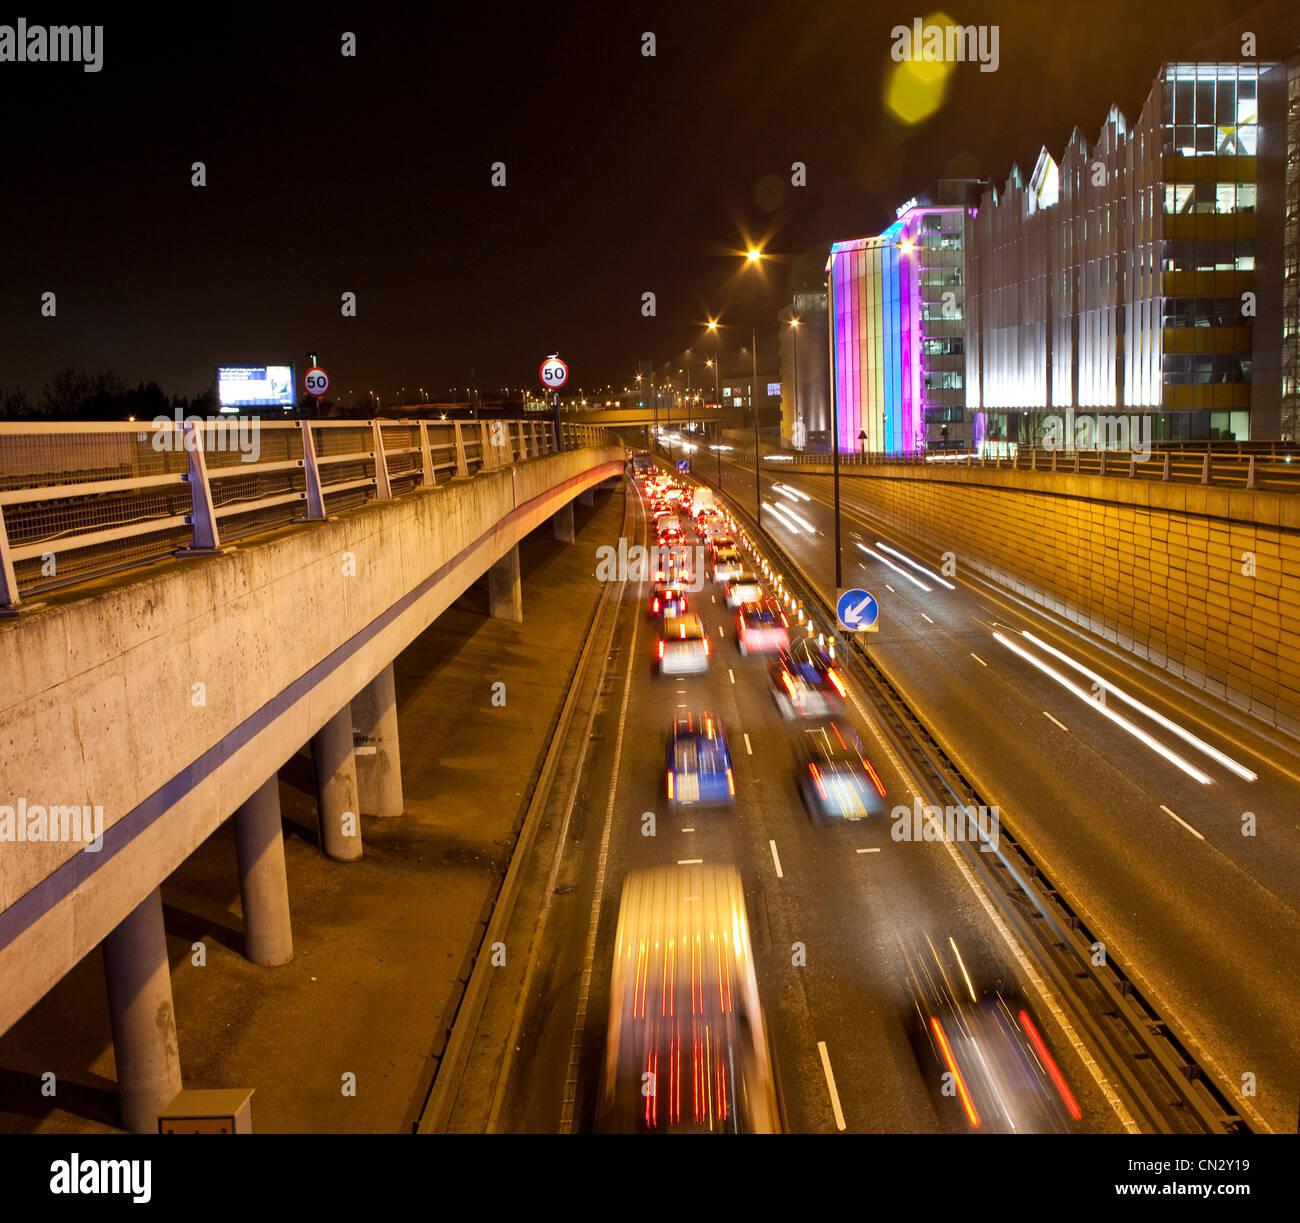 Straßenverkehr in urbanen Szene in der Nacht, London, England Stockbild